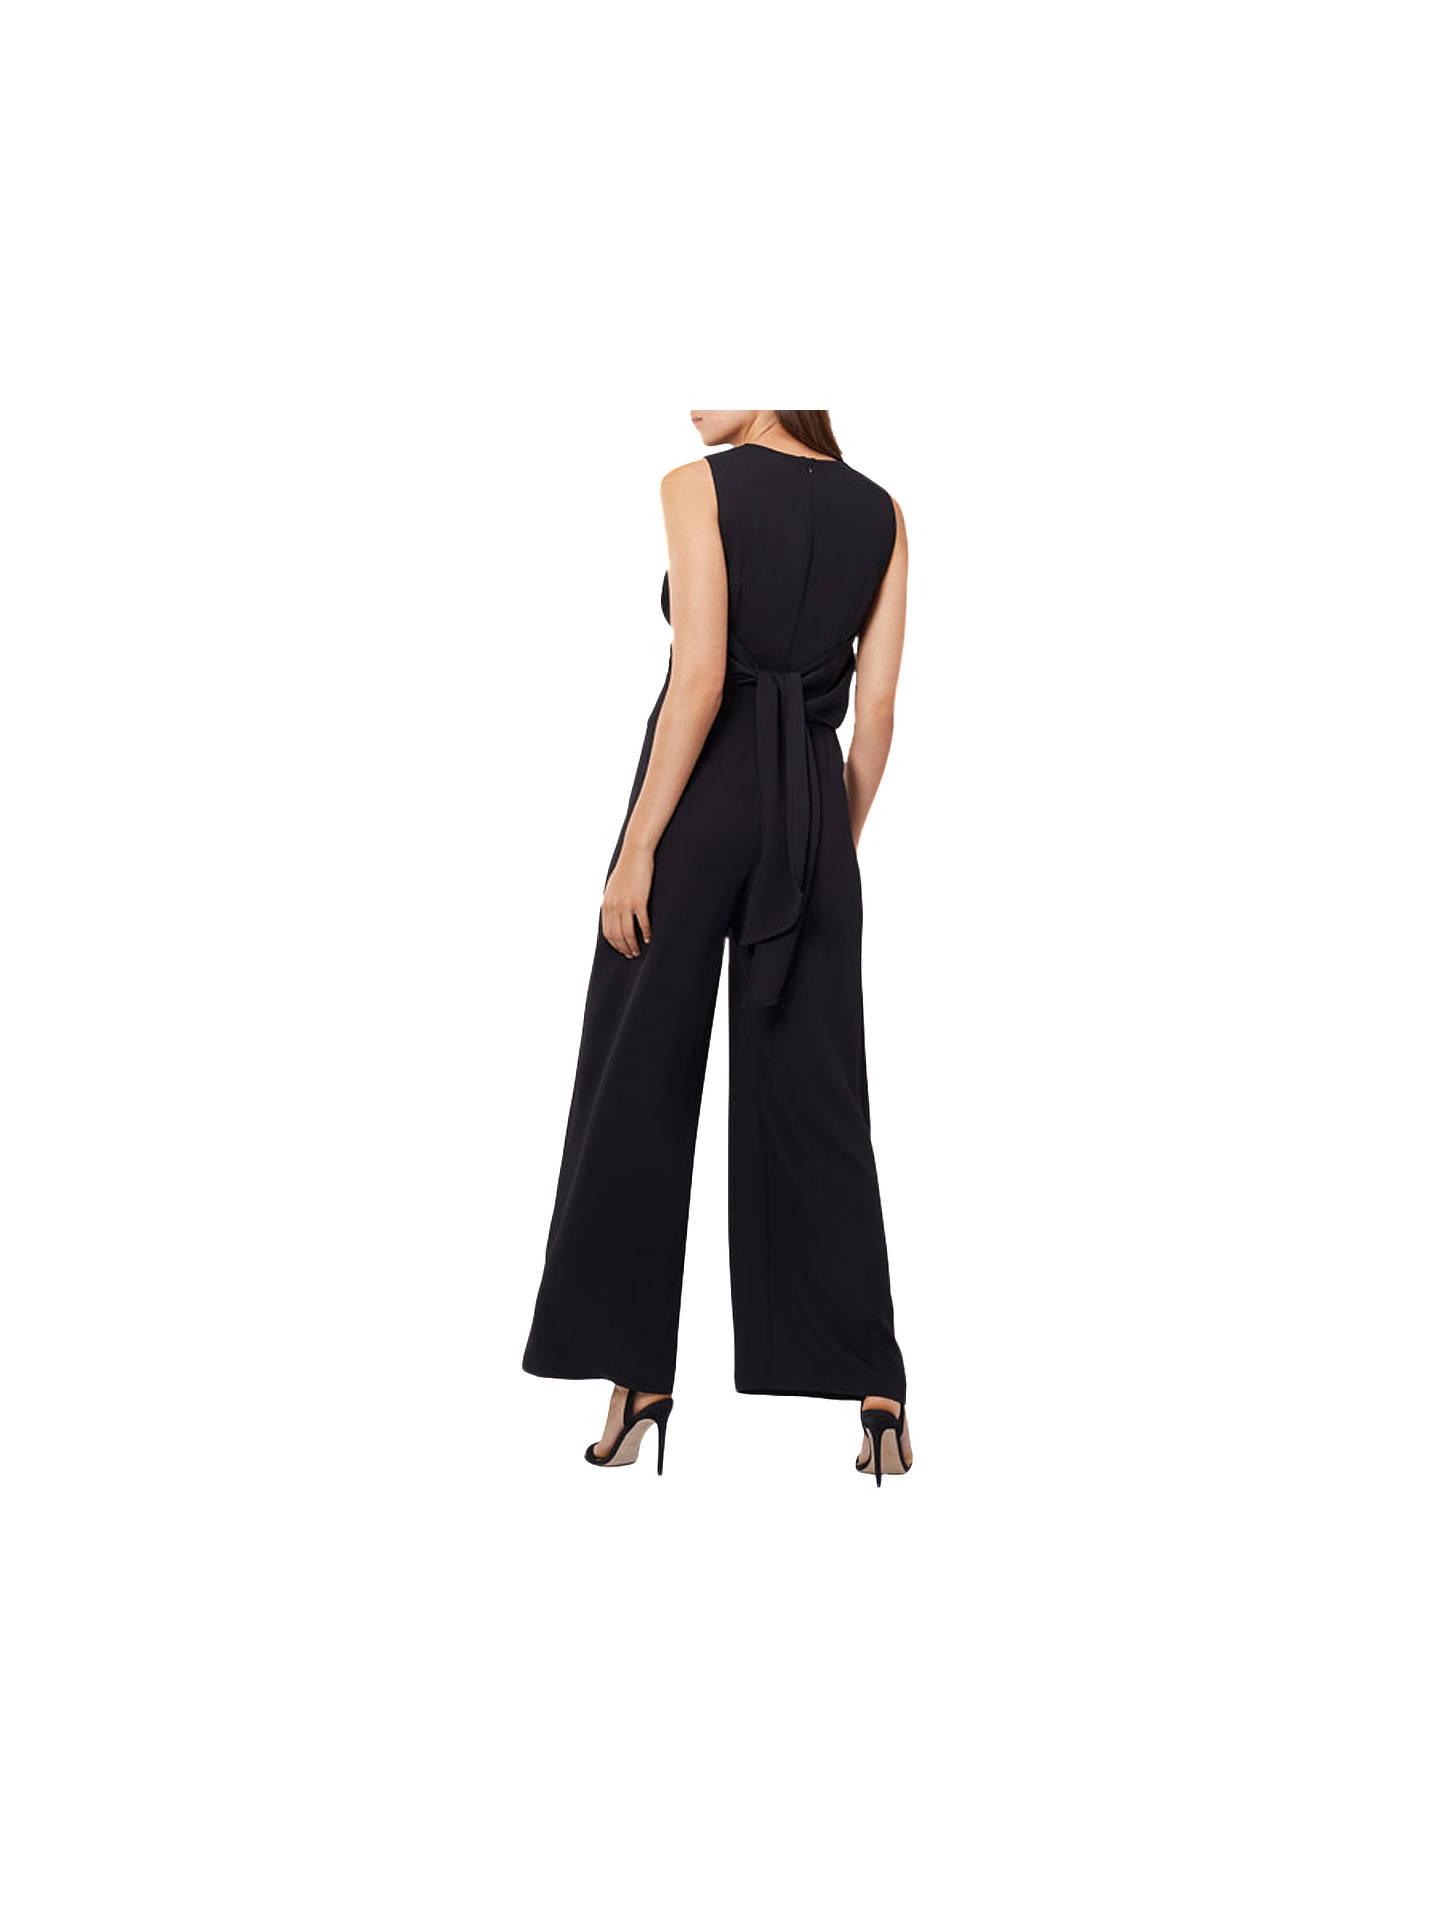 23a5d2b15571 ... Buy Coast Mimi Jumpsuit